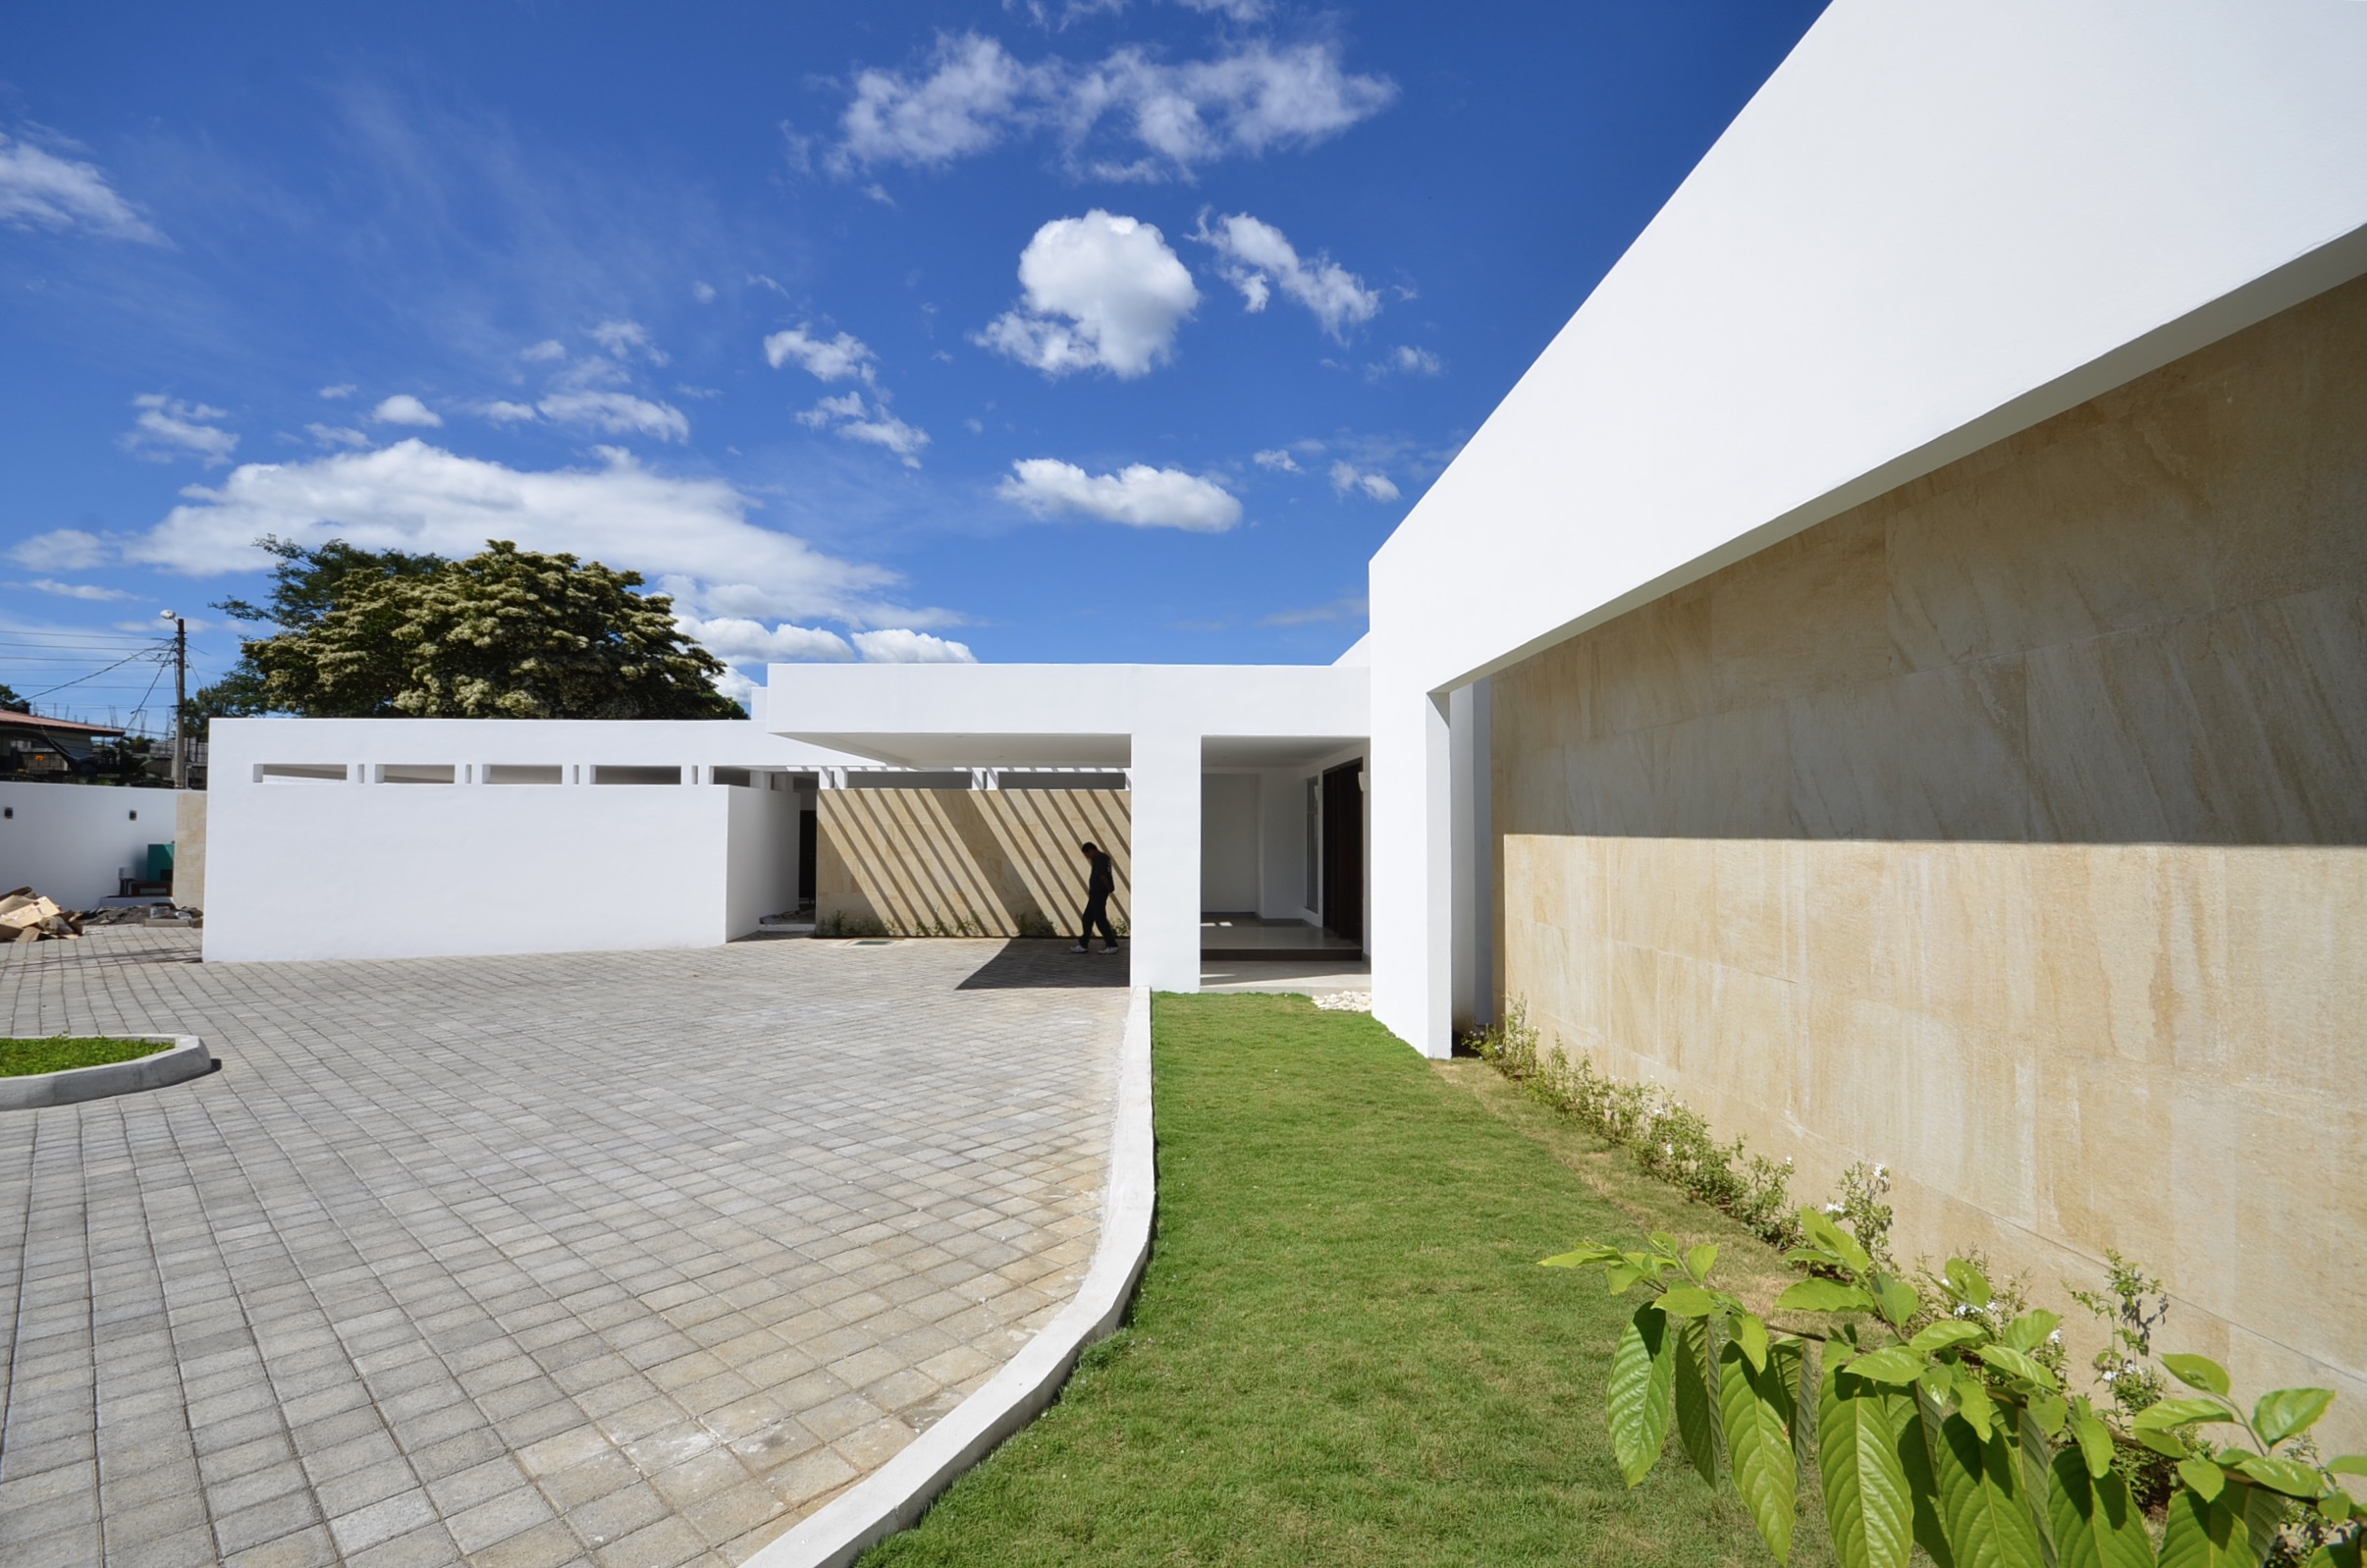 Decent garrage, exterior design, EL Mirador Residence